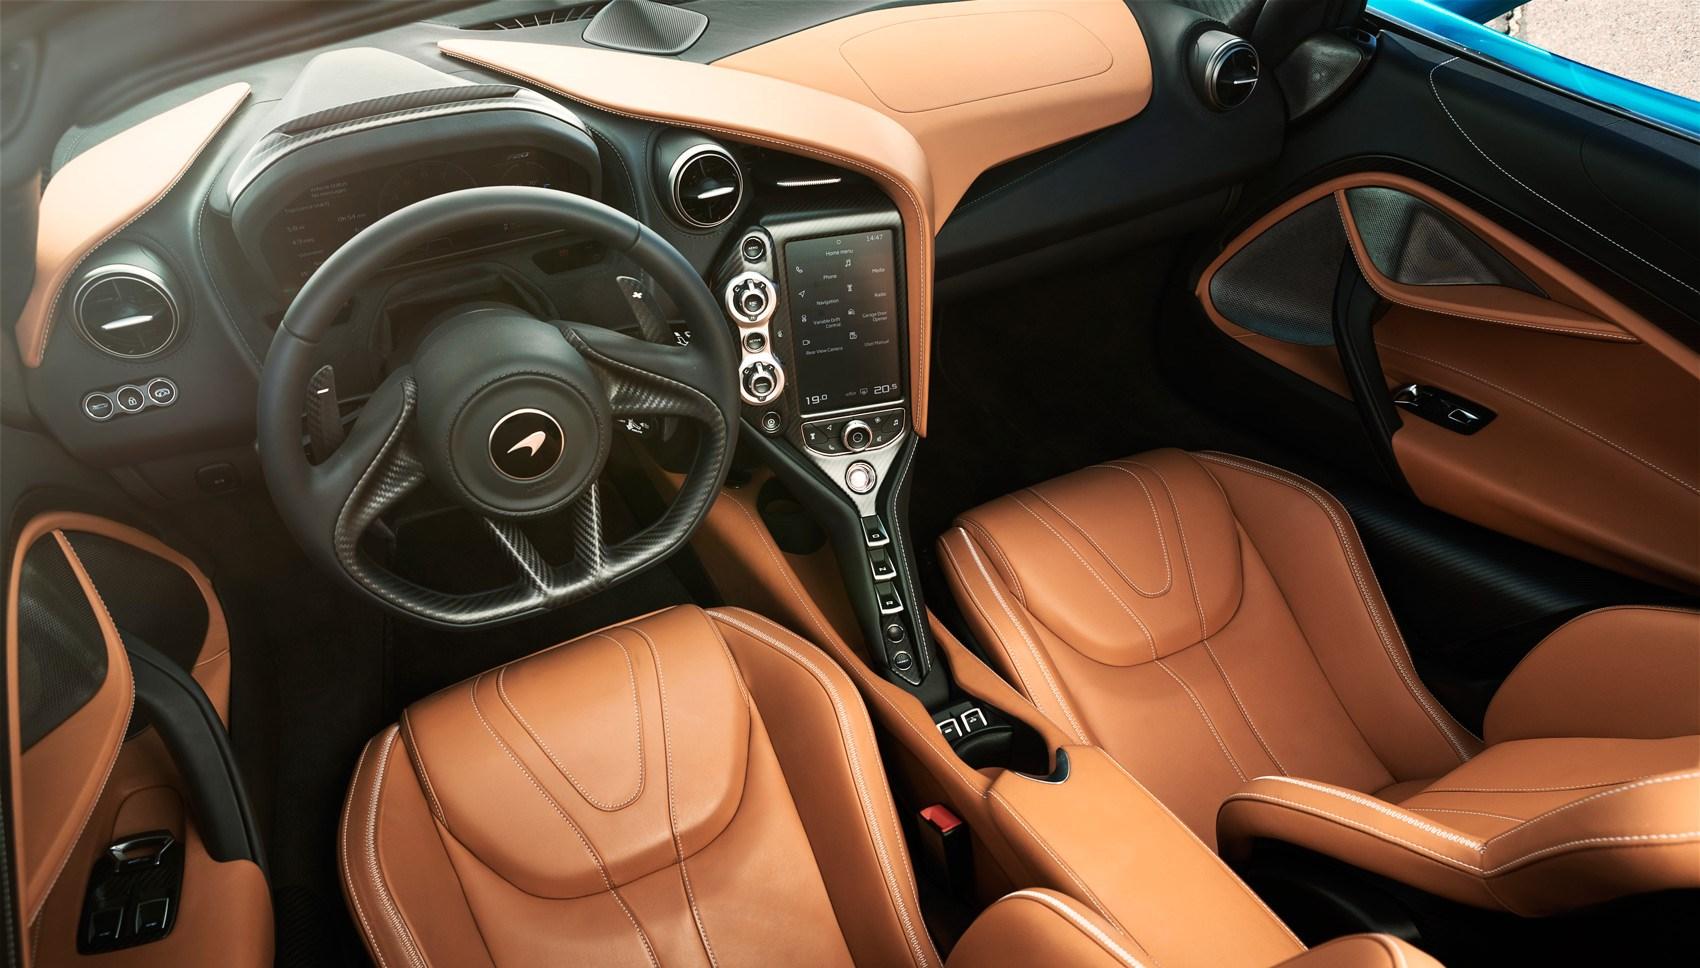 720S Spider interior